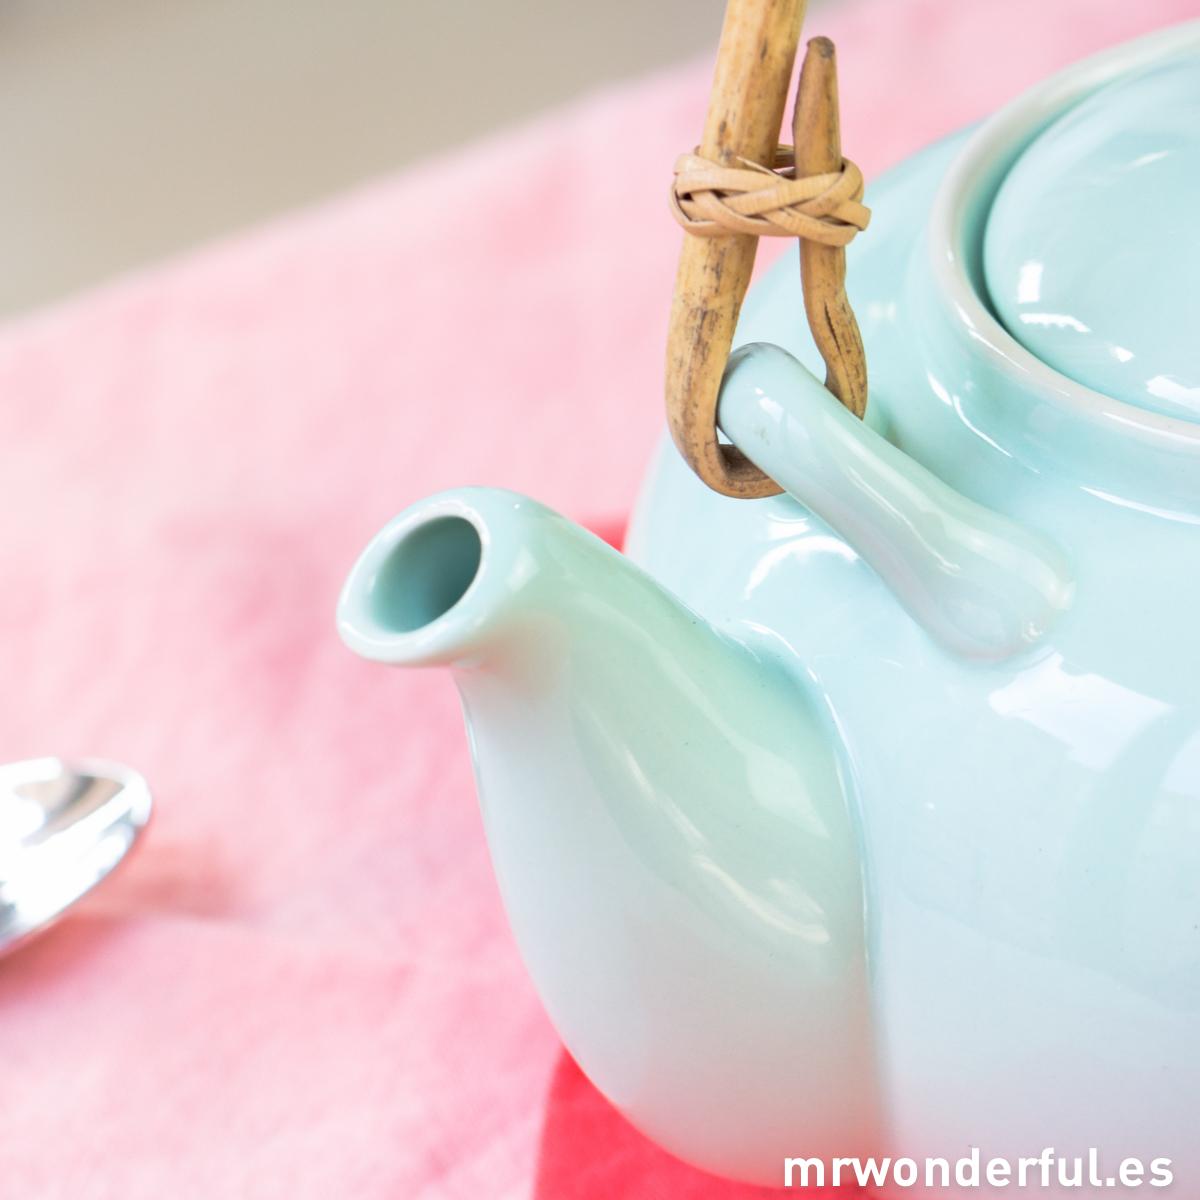 mrwonderful_21100103_2_tetera-ceramica-tonos-pastel-mint-11